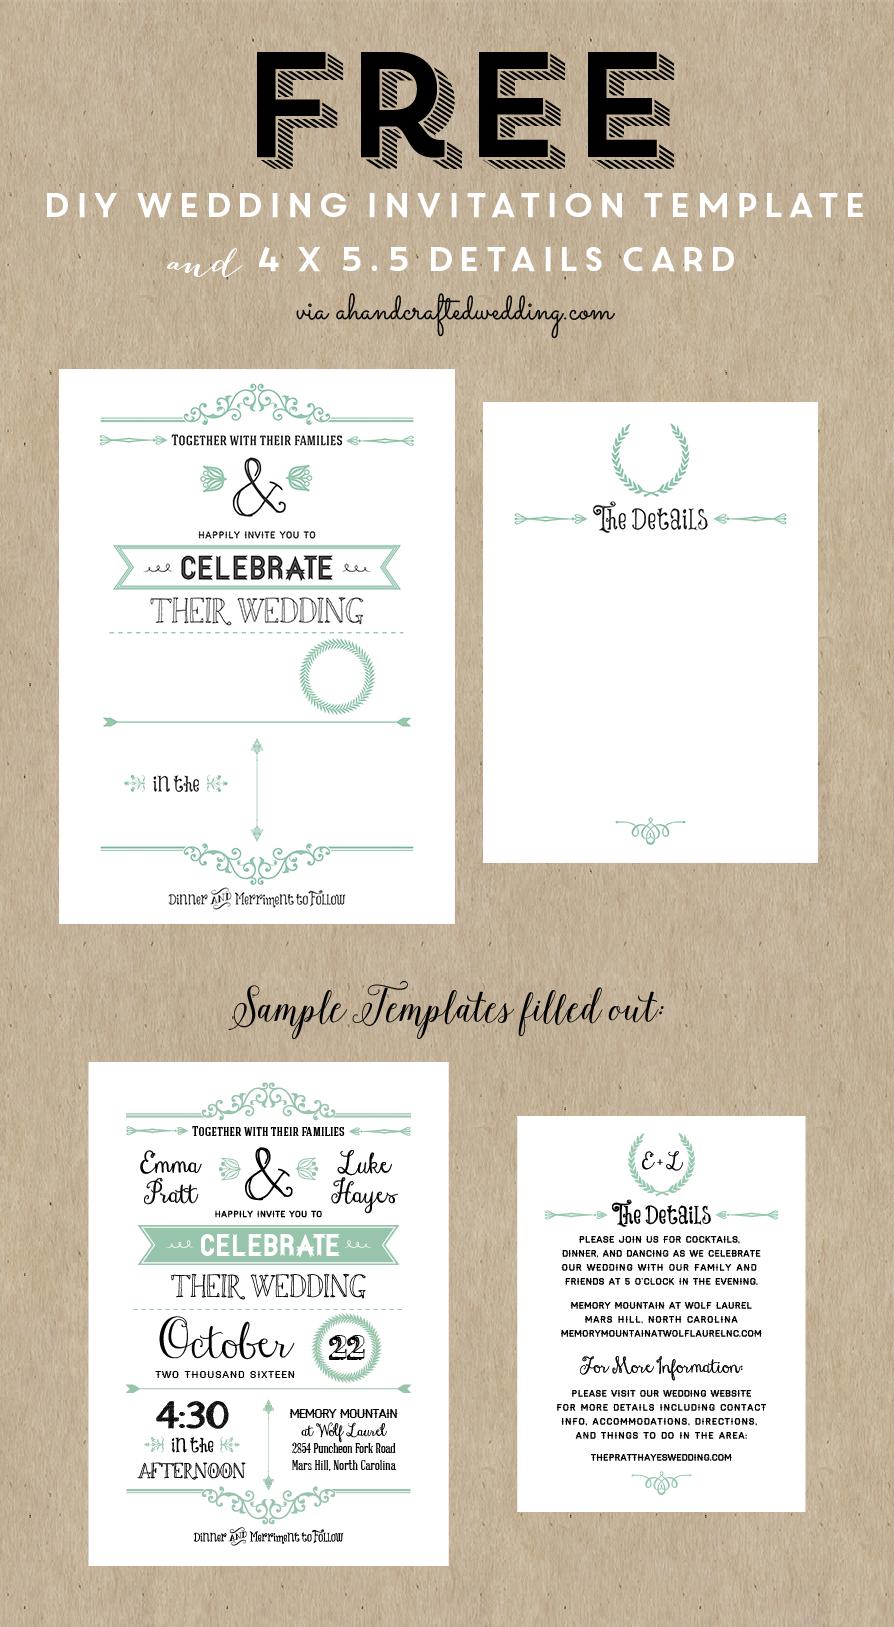 Free Printable Wedding Invitation Template | Wedding | Free Wedding - Wedding Invitation Cards Printable Free